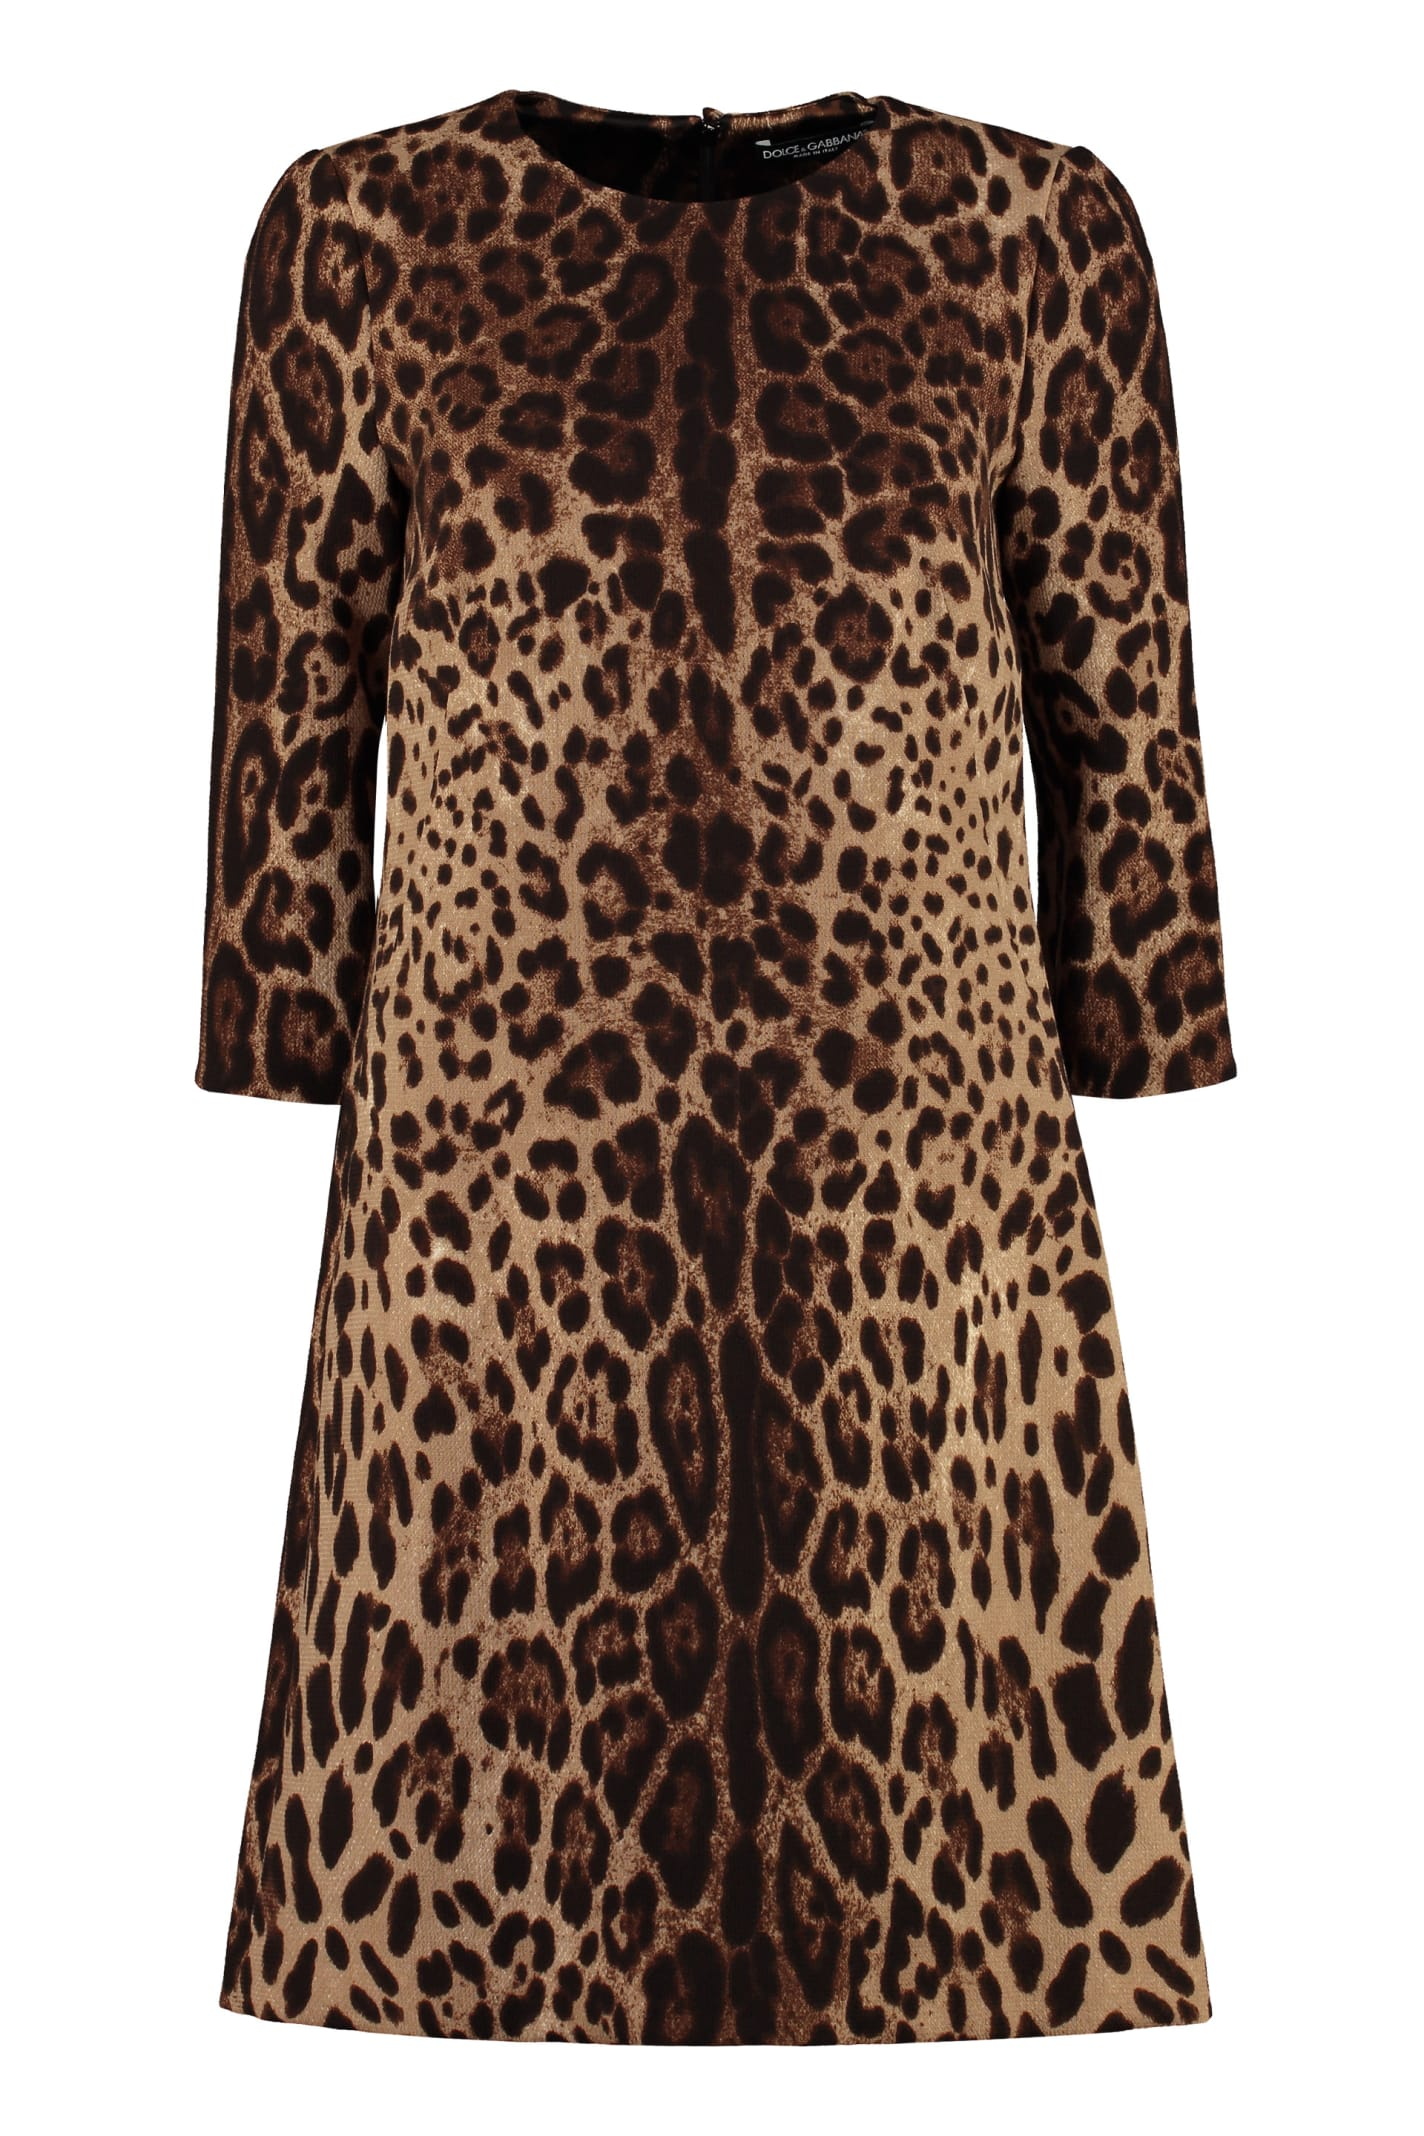 Dolce & Gabbana Printed Wool Dress